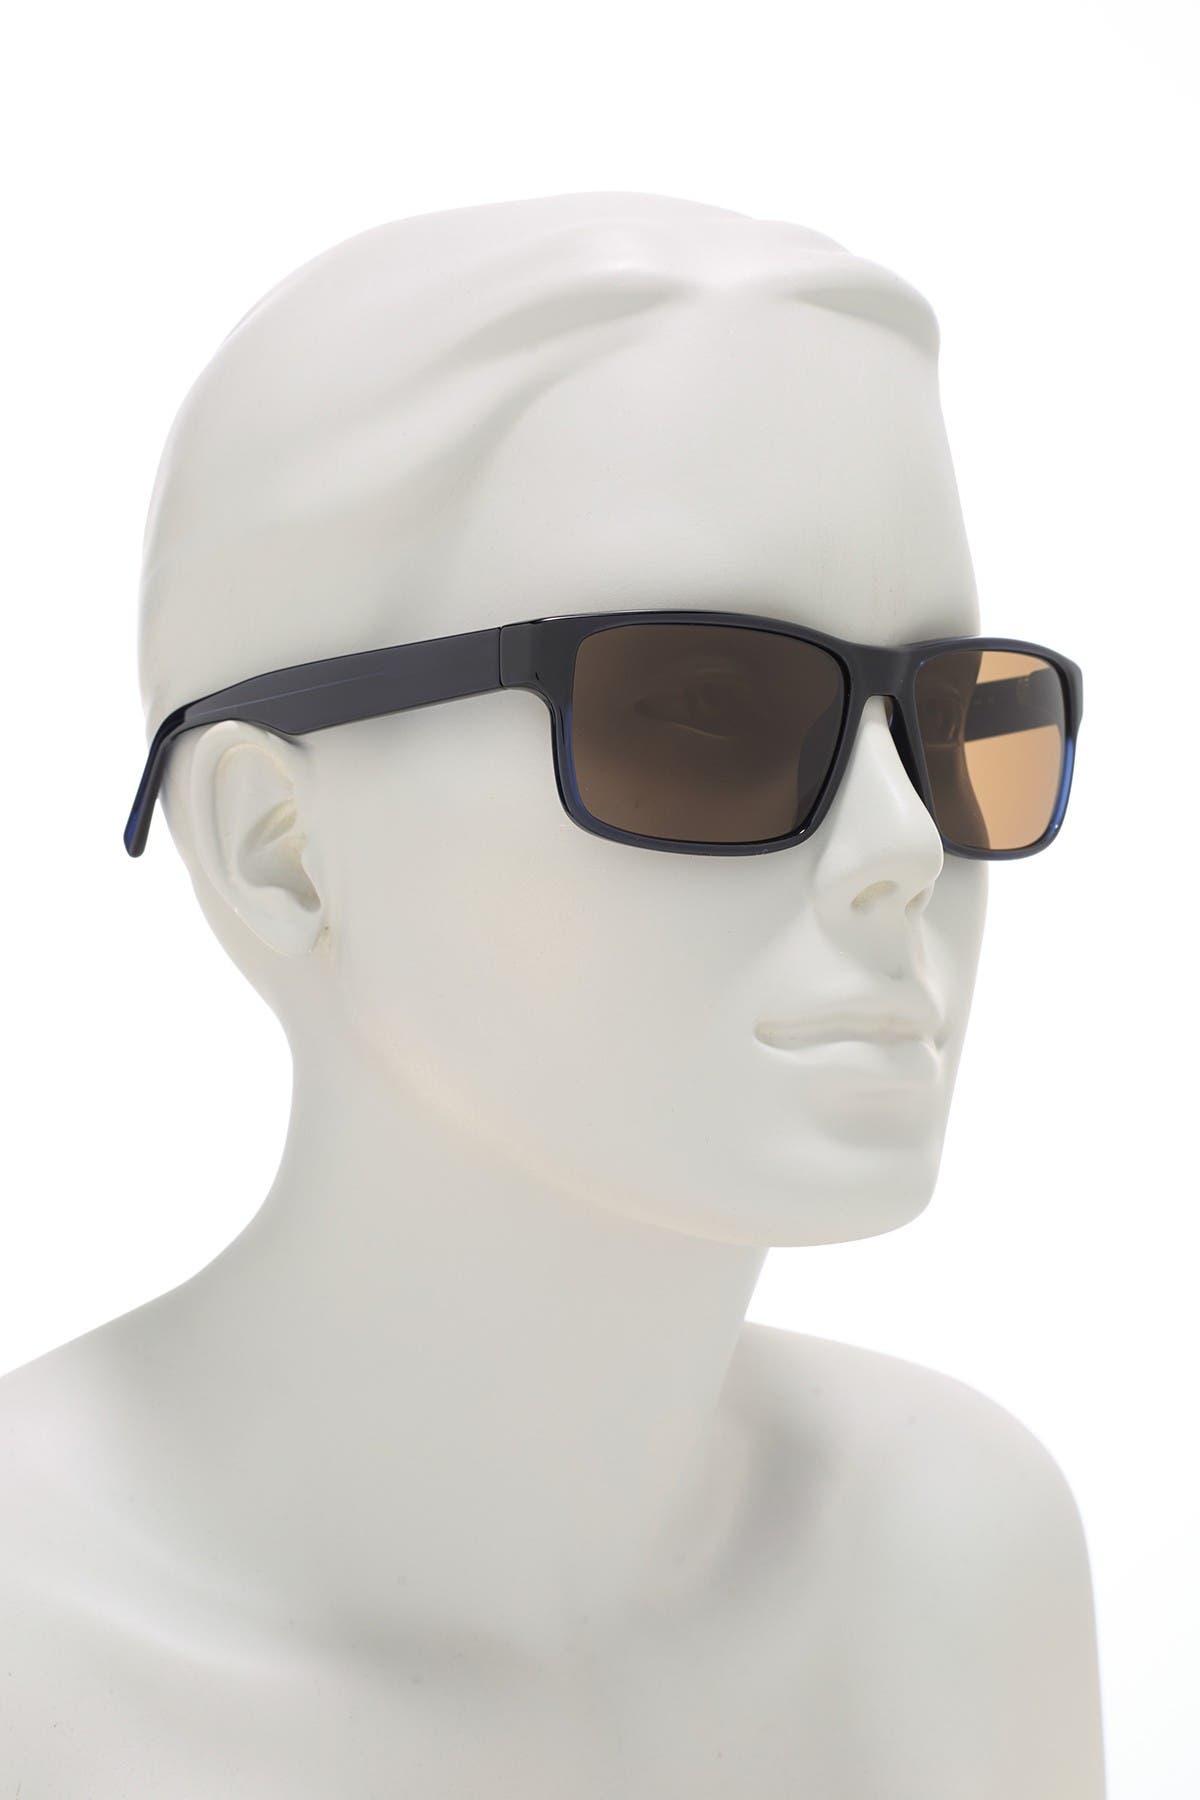 Image of Salvatore Ferragamo 58mm Rectangle Sunglasses